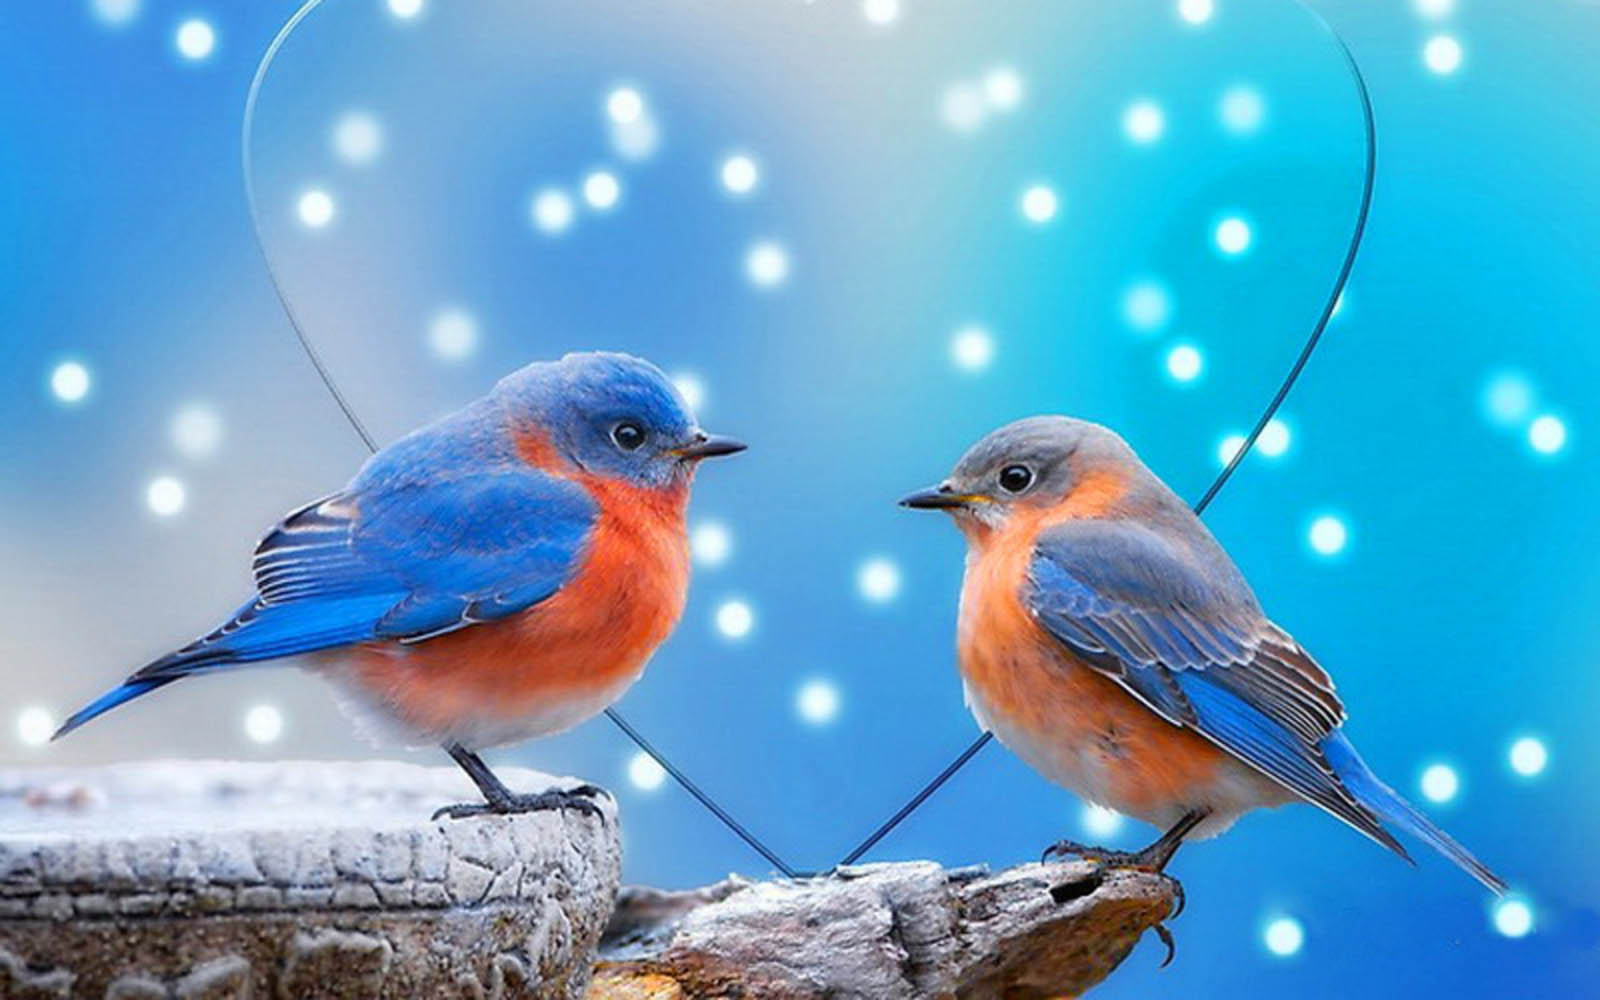 Wallpapers Love Birds: Love Birds Wallpapers:Image For Pc Wallpaper